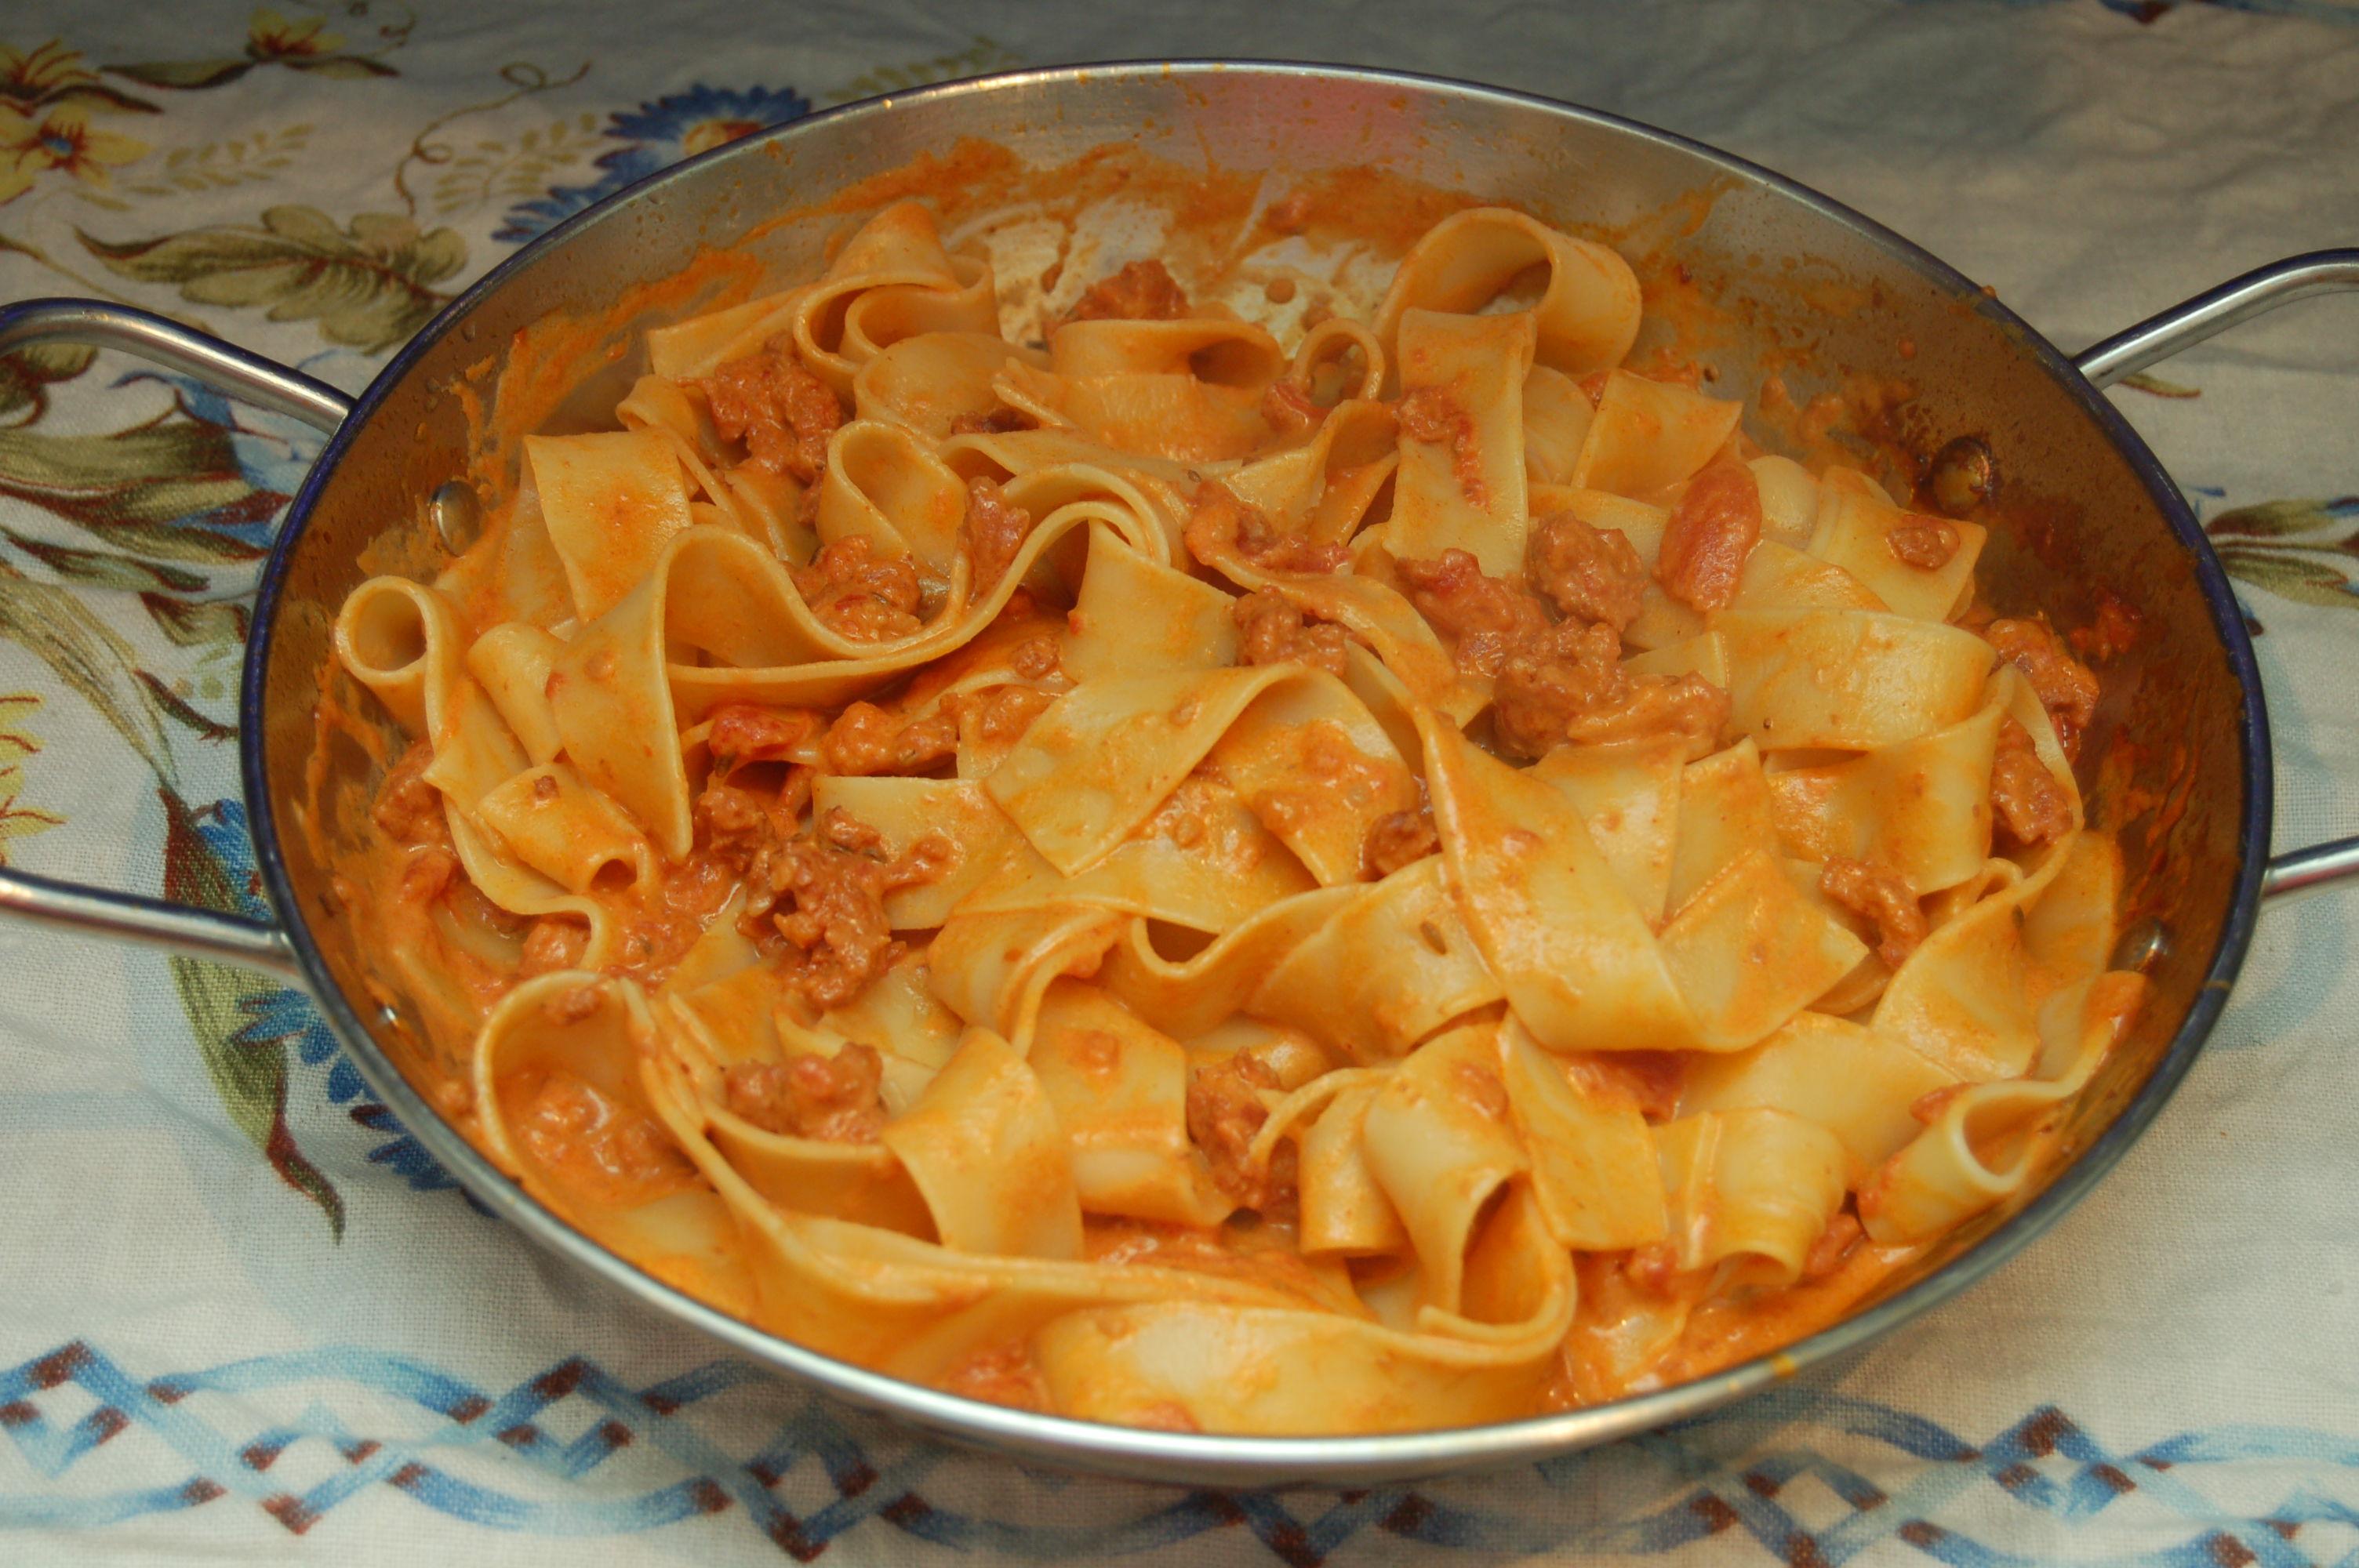 Picture of Chorizo, Mascarpone and Tomato Pasta Sauce